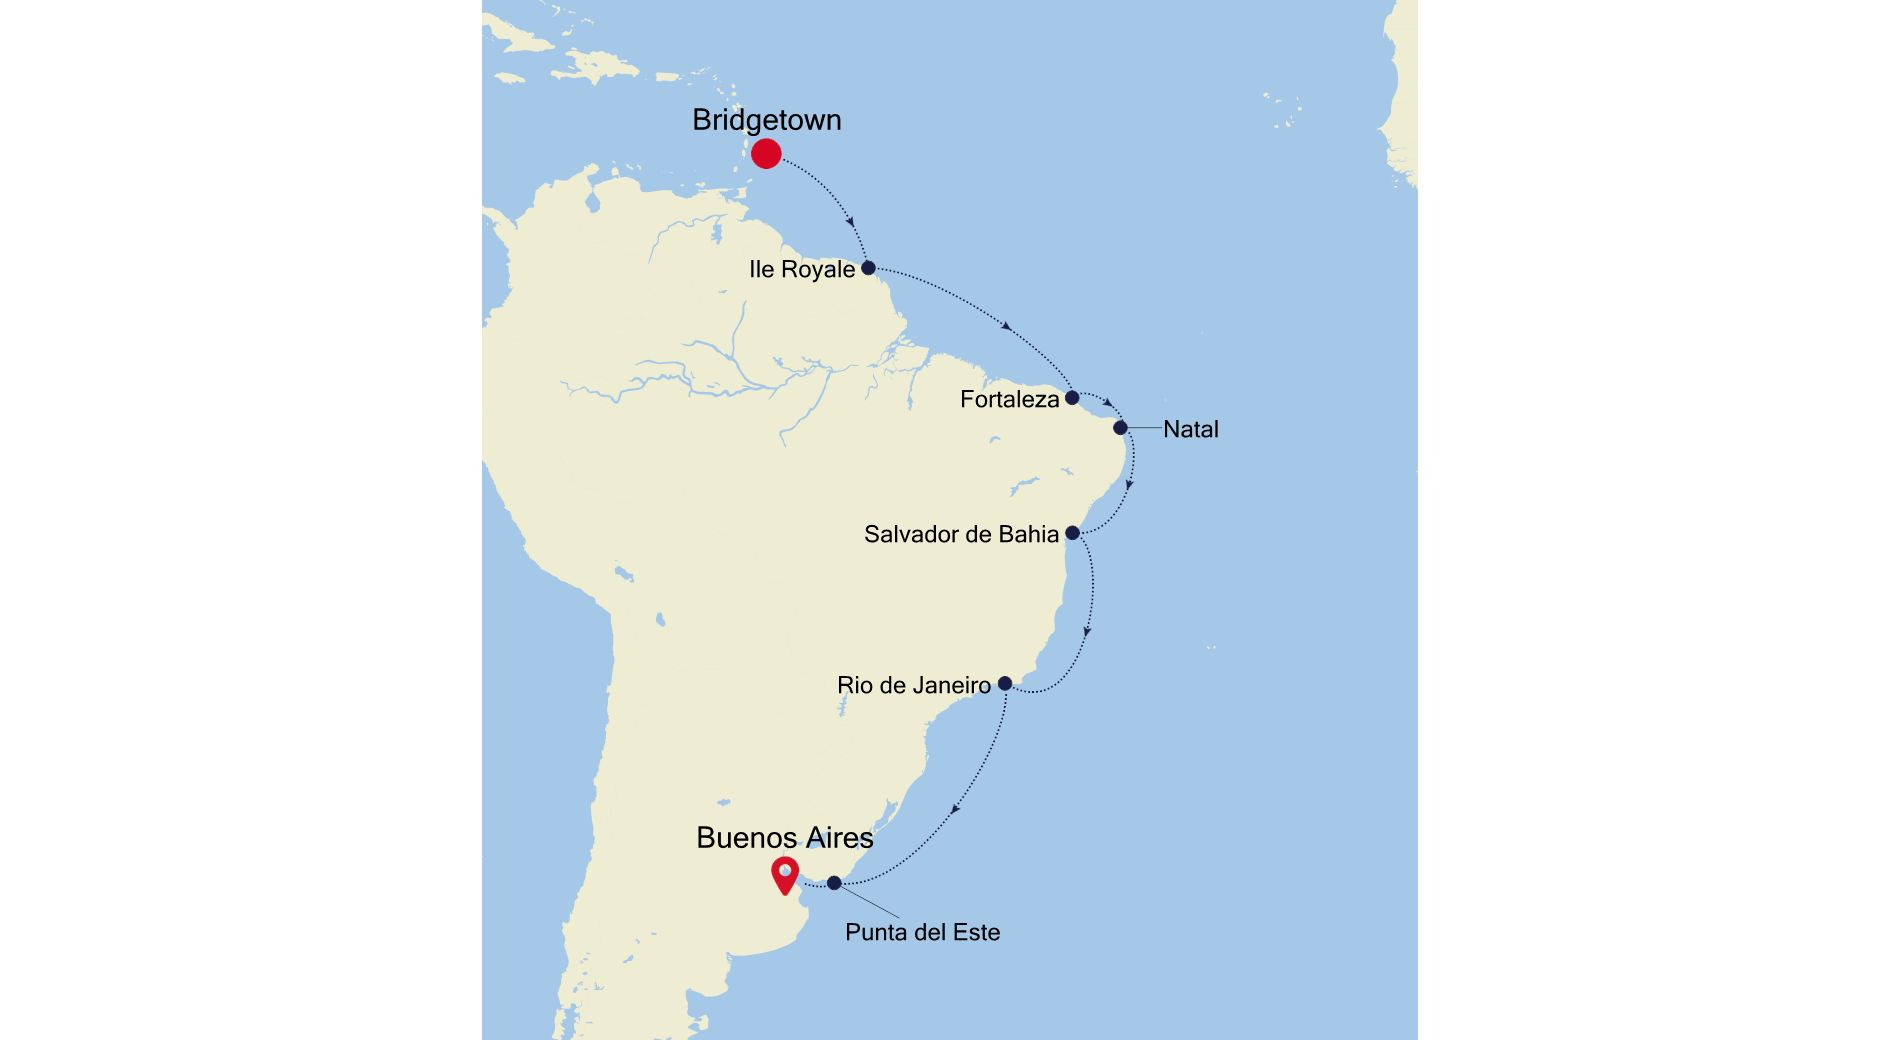 4001A - Bridgetown a Buenos Aires